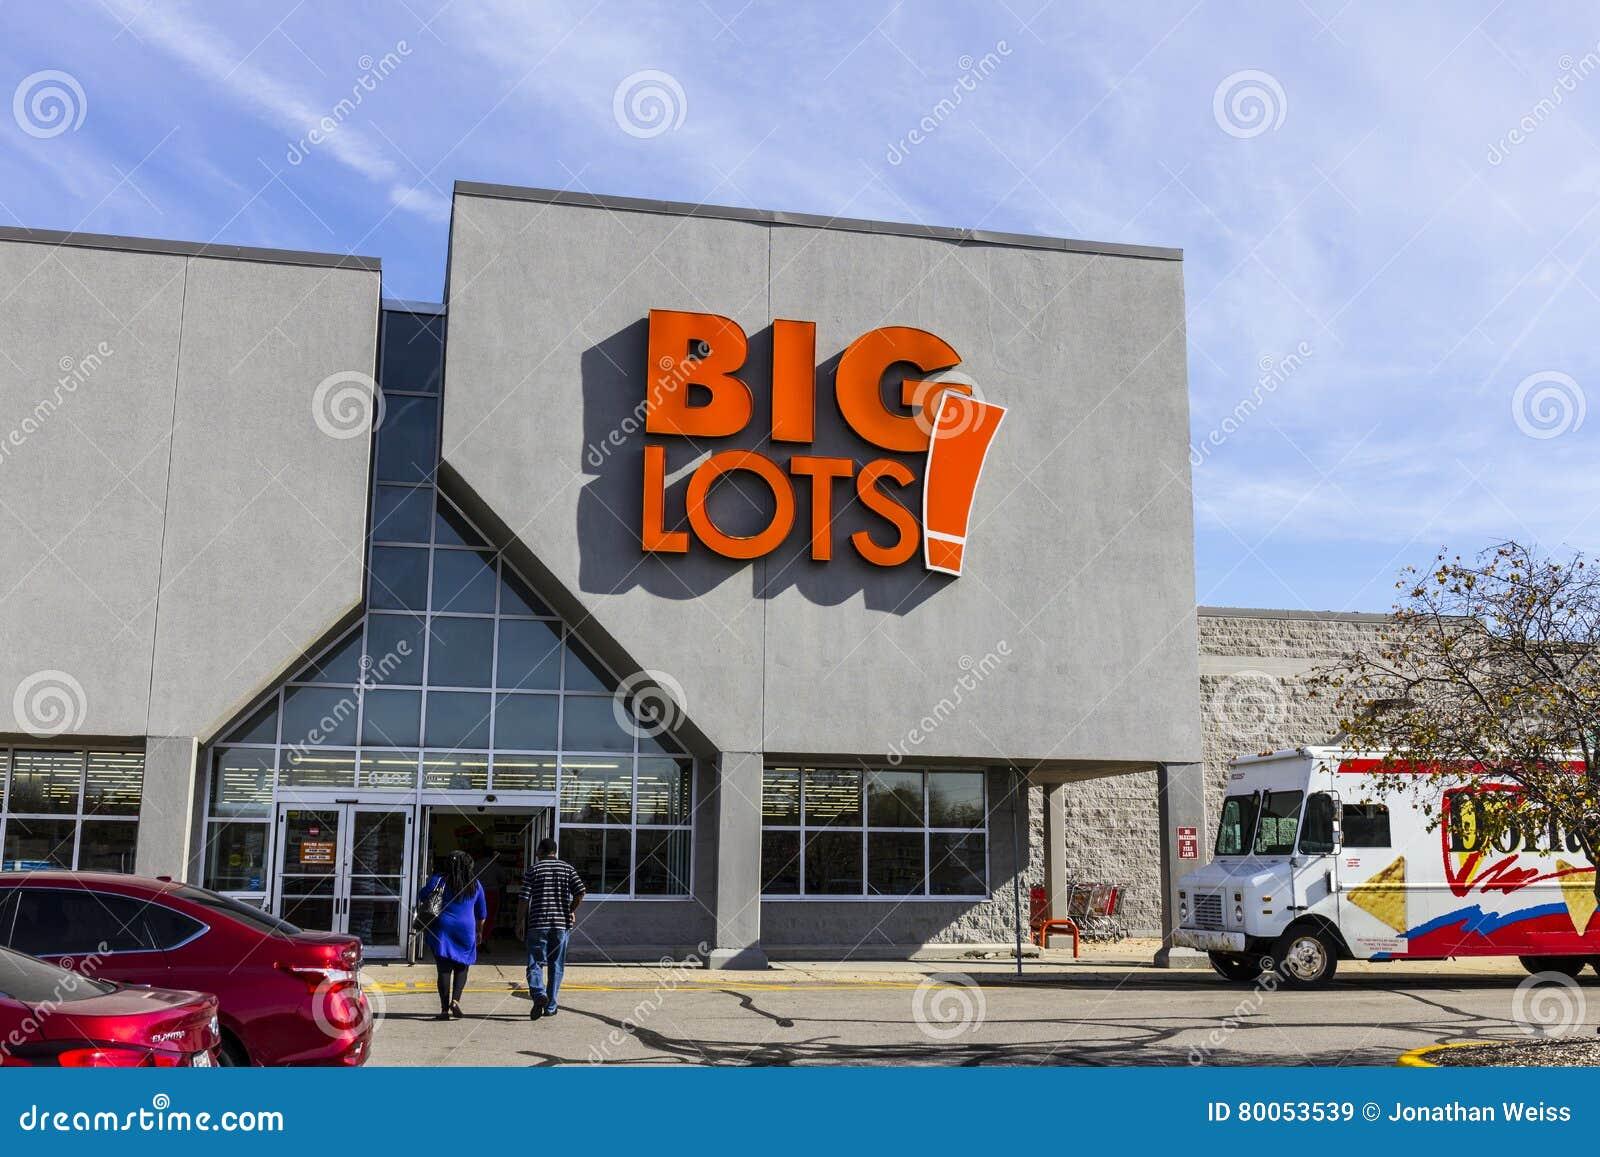 Indianapolis - Circa November 2016: Big Lots Retail Discount Location. Big Lots is a Discount Chain IV